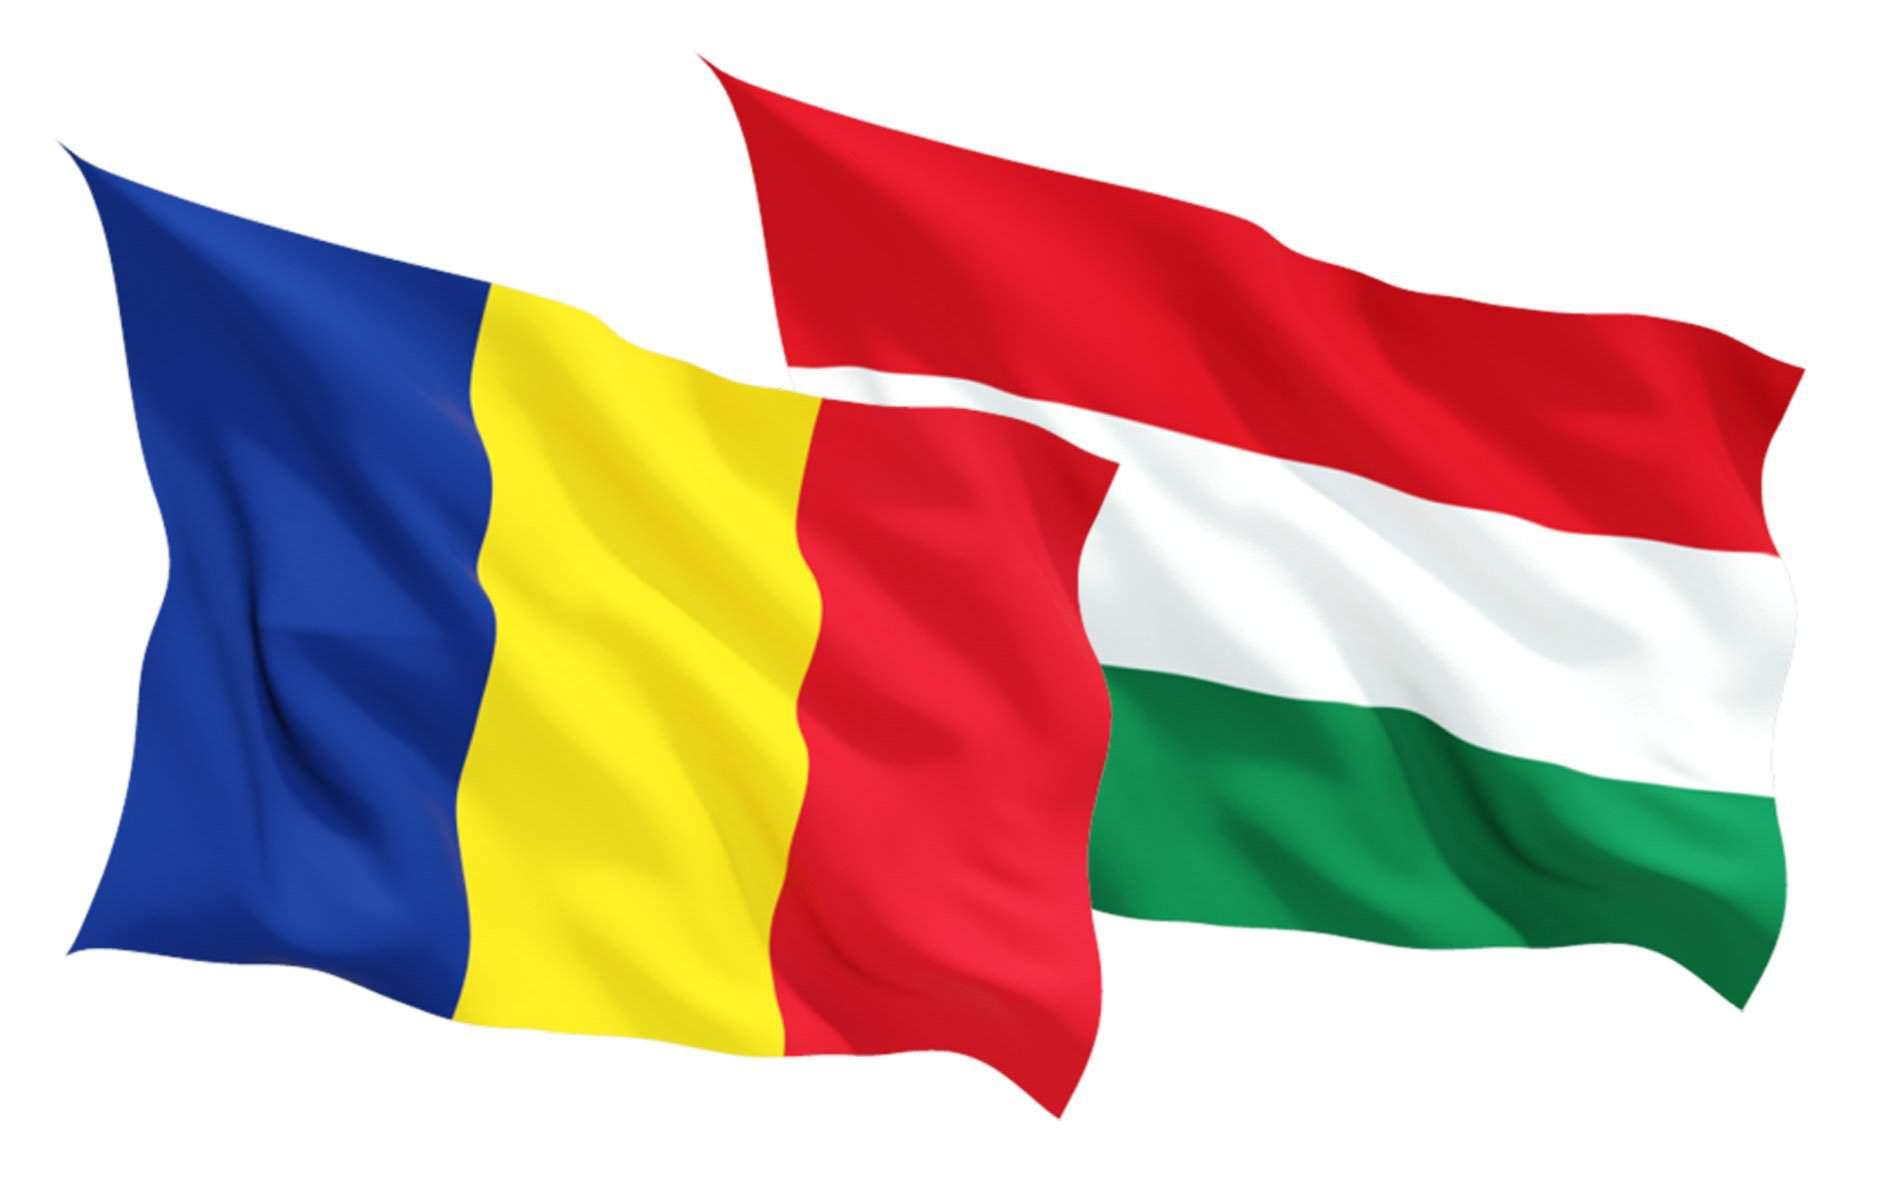 Ten temporary crossings open on Hungarian-Romanian border